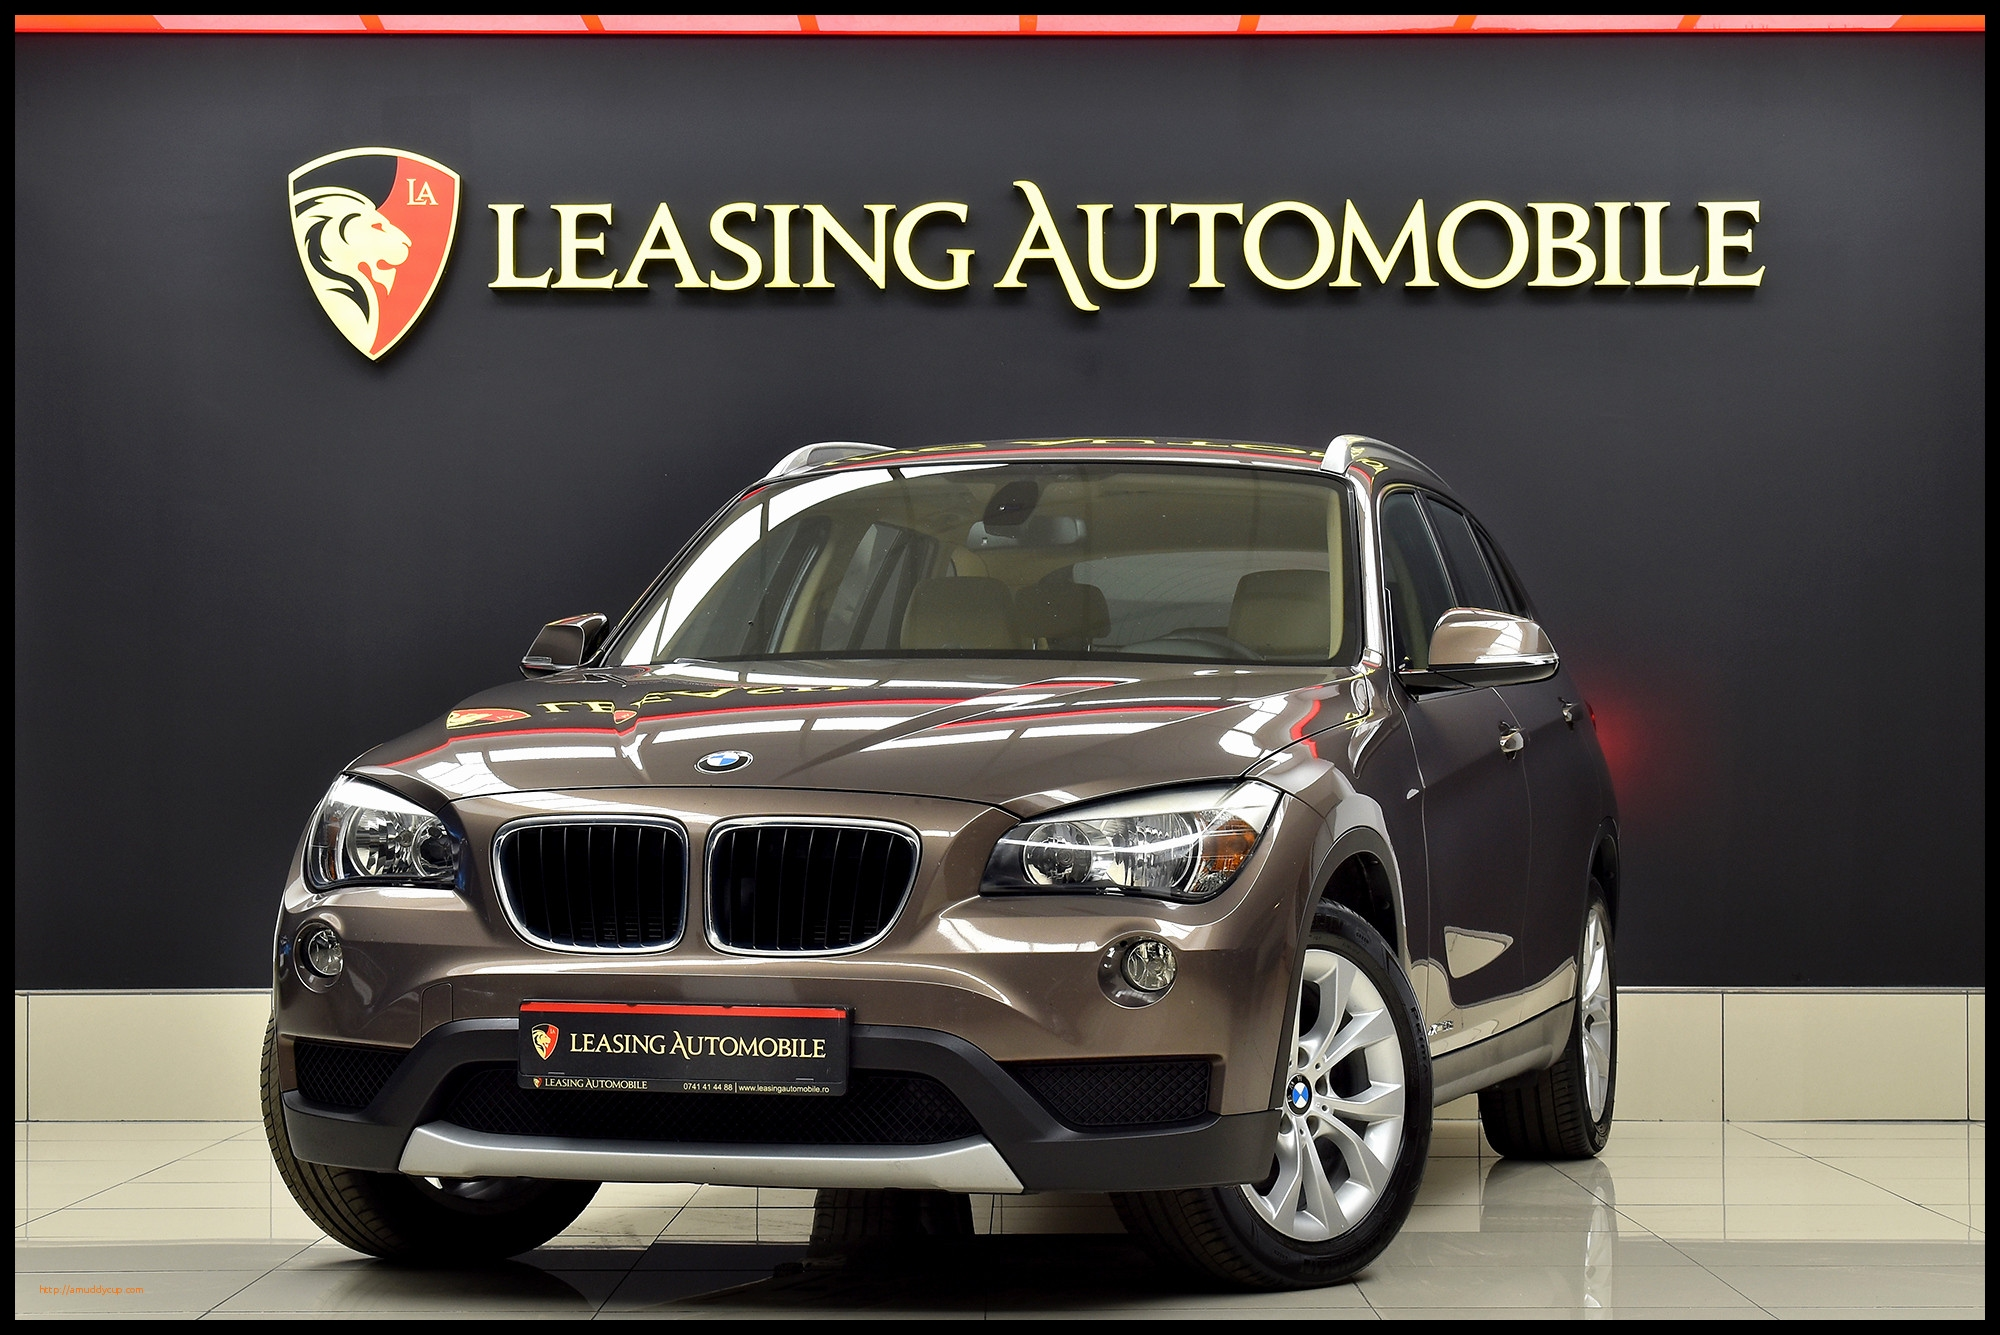 Bmw Dealer Roseville Inspirational Lease Bmw X1 Beautiful Auto Rulate Bmw X1 2 0d 143 C P